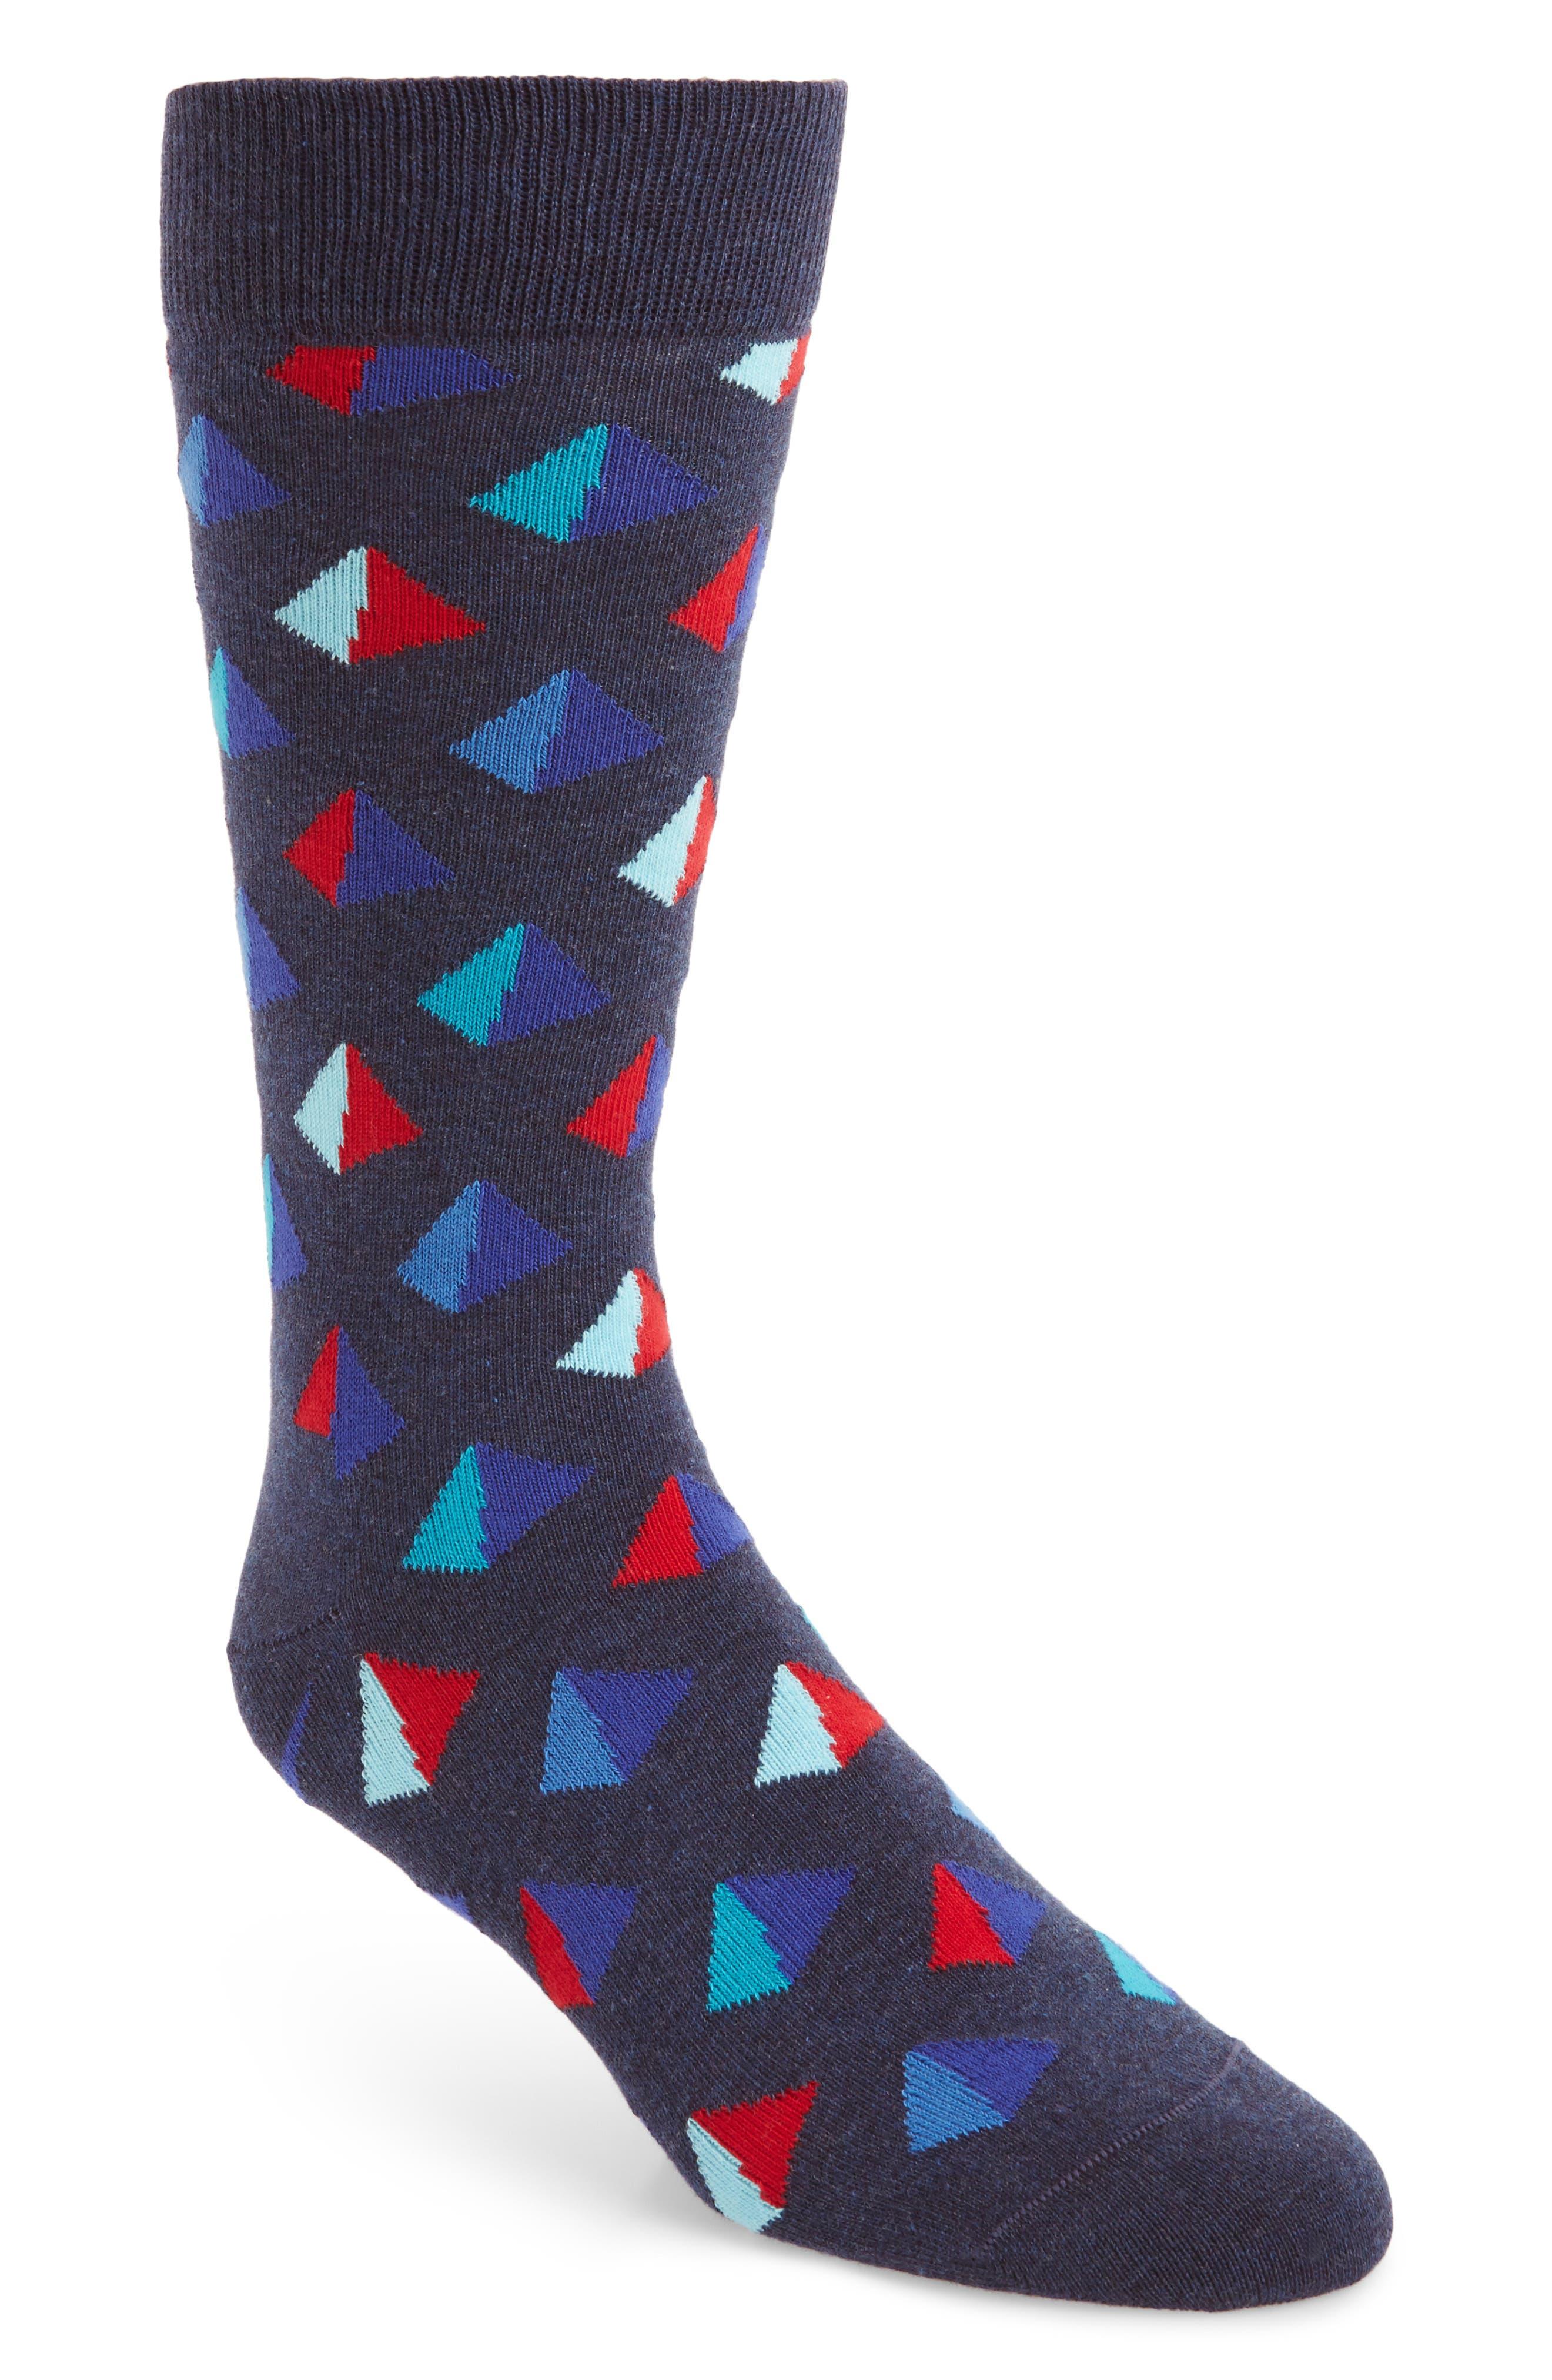 Pyramid Socks,                             Main thumbnail 1, color,                             NAVY MULTI